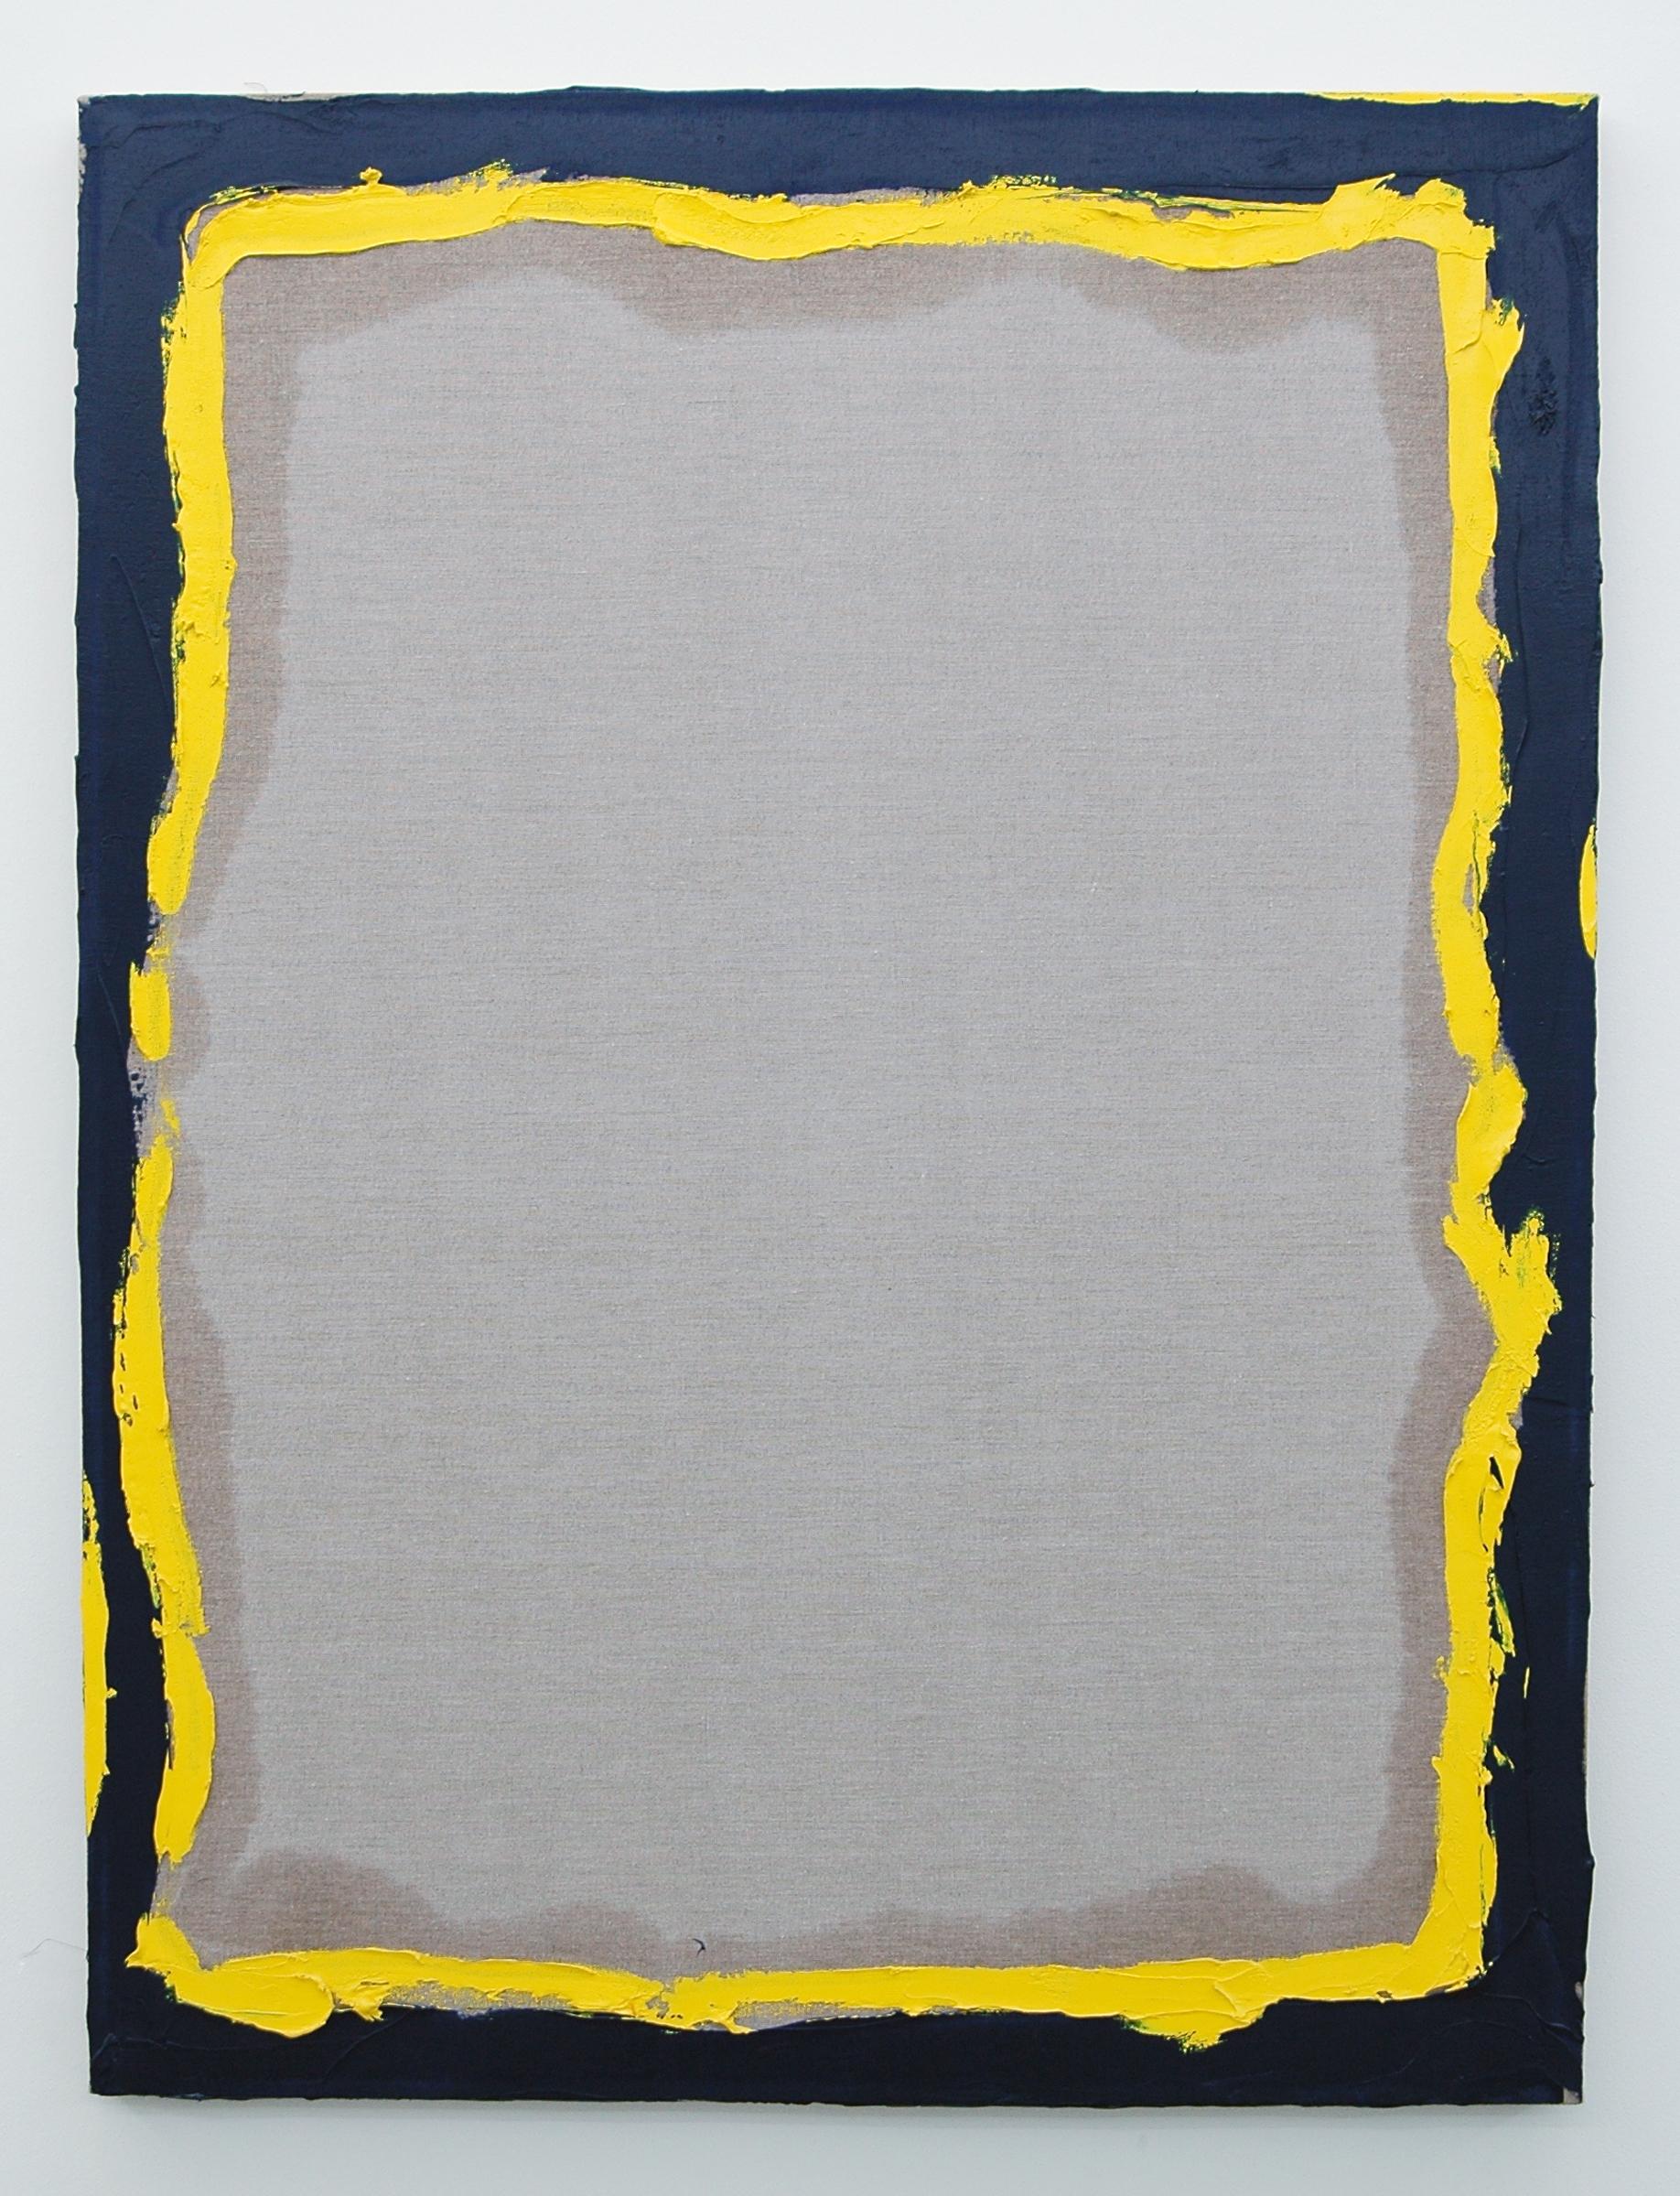 "/SLASH/  Peter Kirkeby, Untitled, oil and rabbit skin glue on linen, 40"" x 30"", 2013"